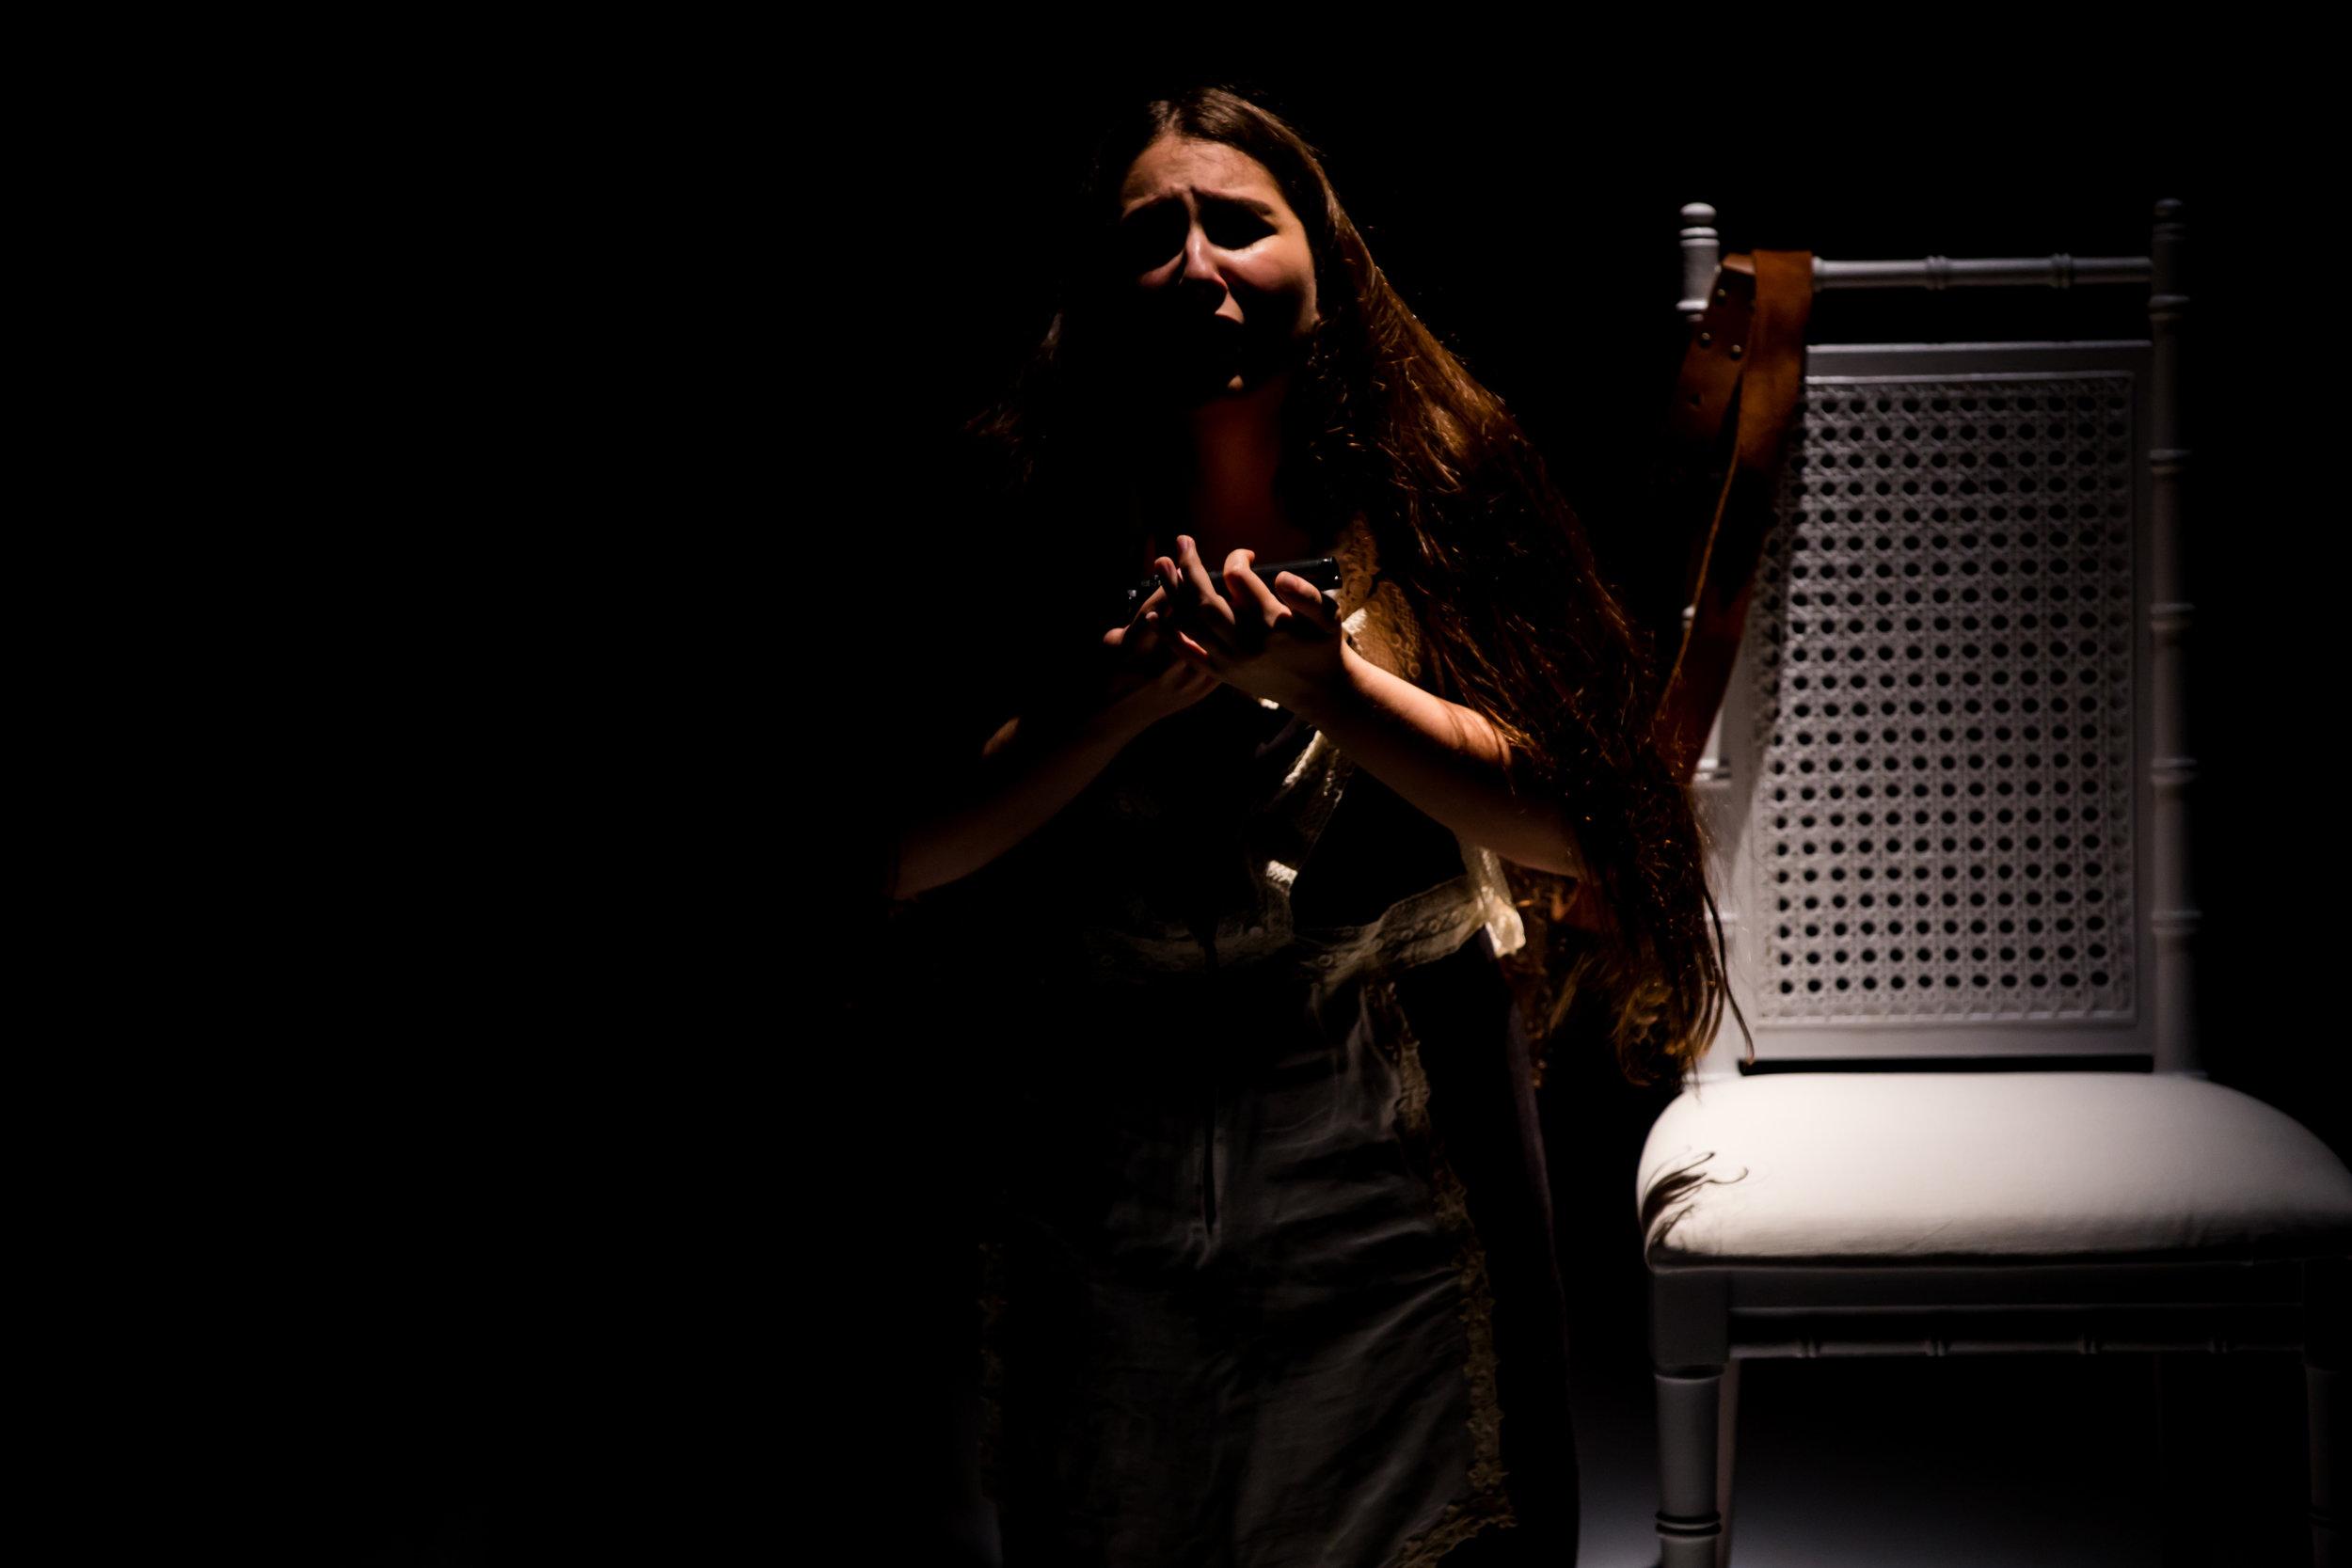 Hero-Theater-Final_17-06-11-0112.jpg